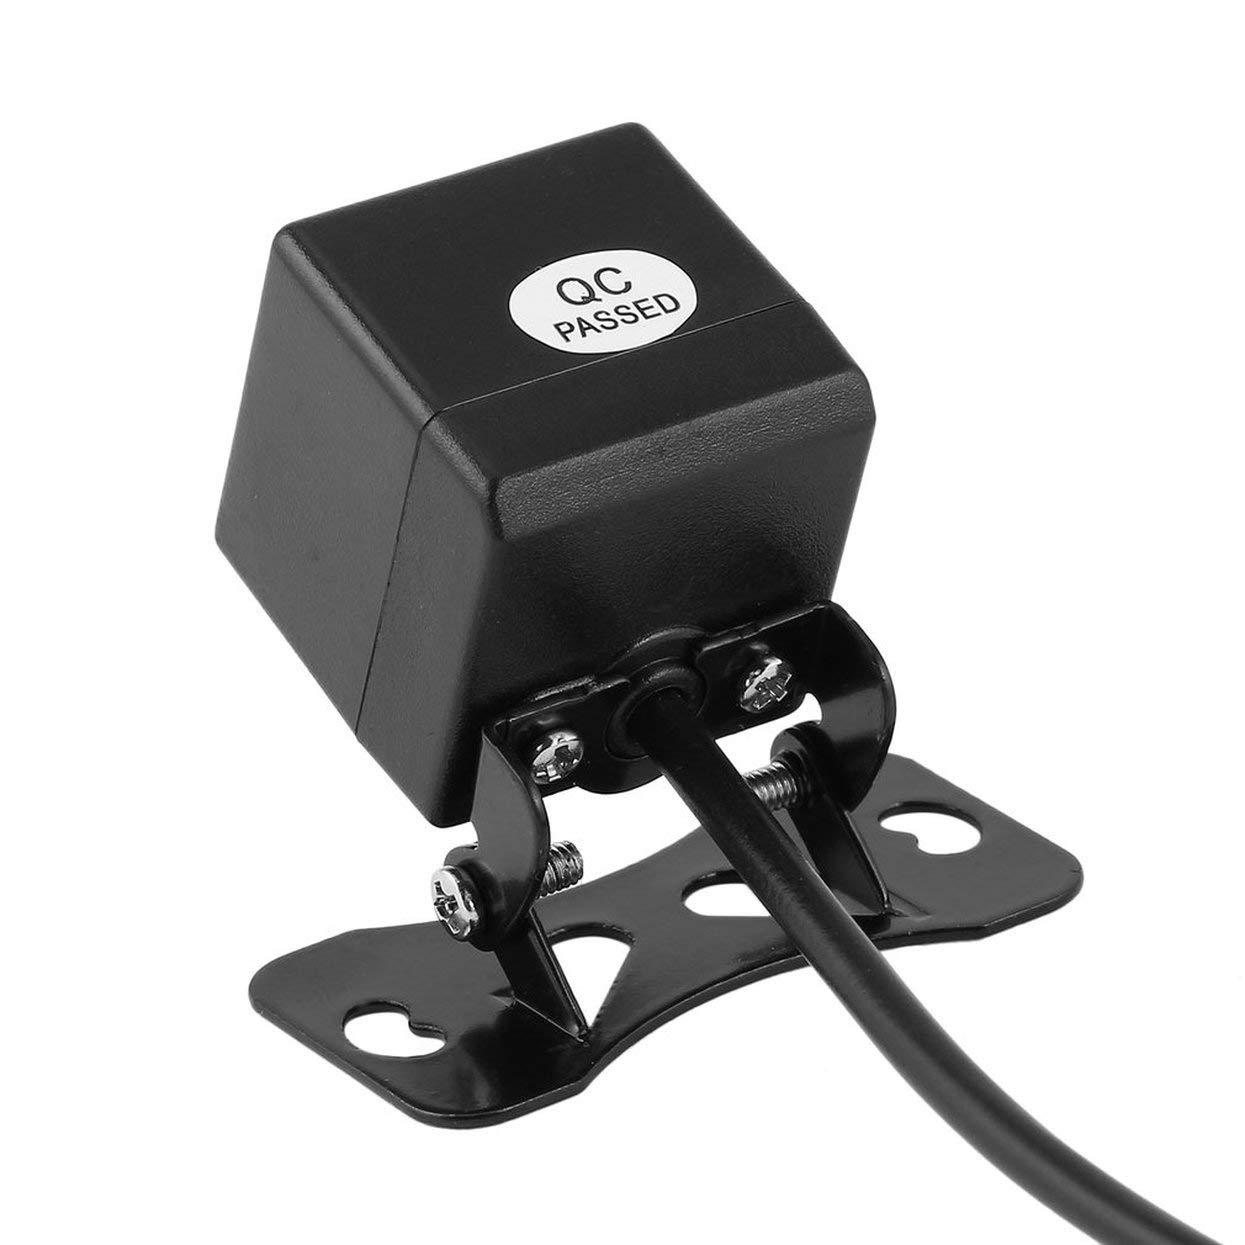 2.4G Transmisor inalá mbrico y Adaptador de Receptor + Impermeable 4 LED Luz Cá mara de visió n Trasera Instalació n fá cil Tellaboull